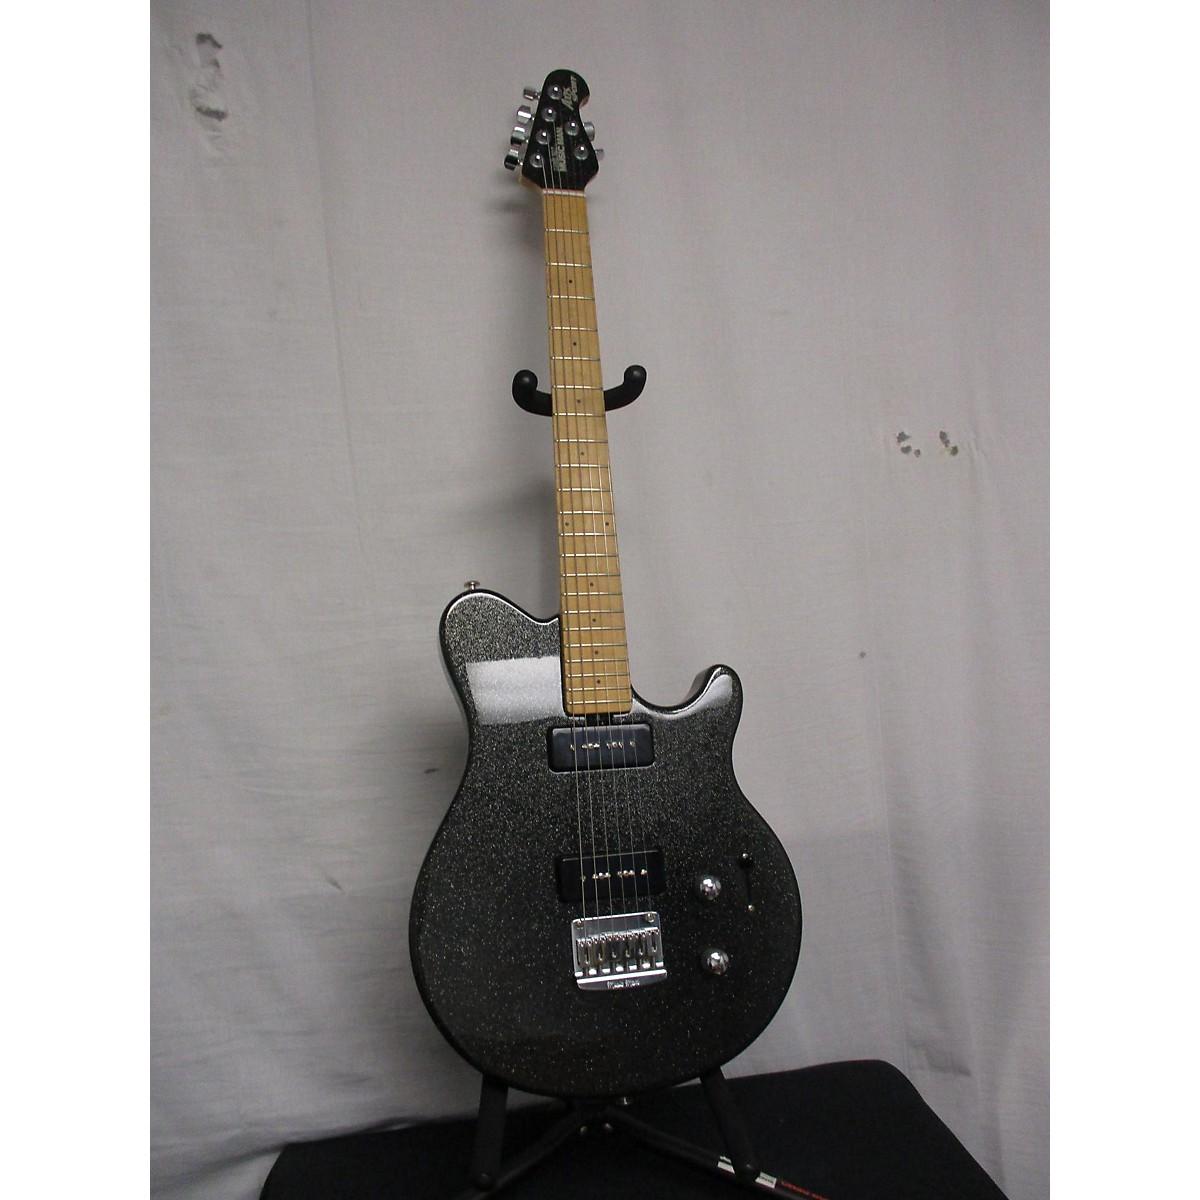 Ernie Ball Music Man Axis Super Sport Solid Body Electric Guitar